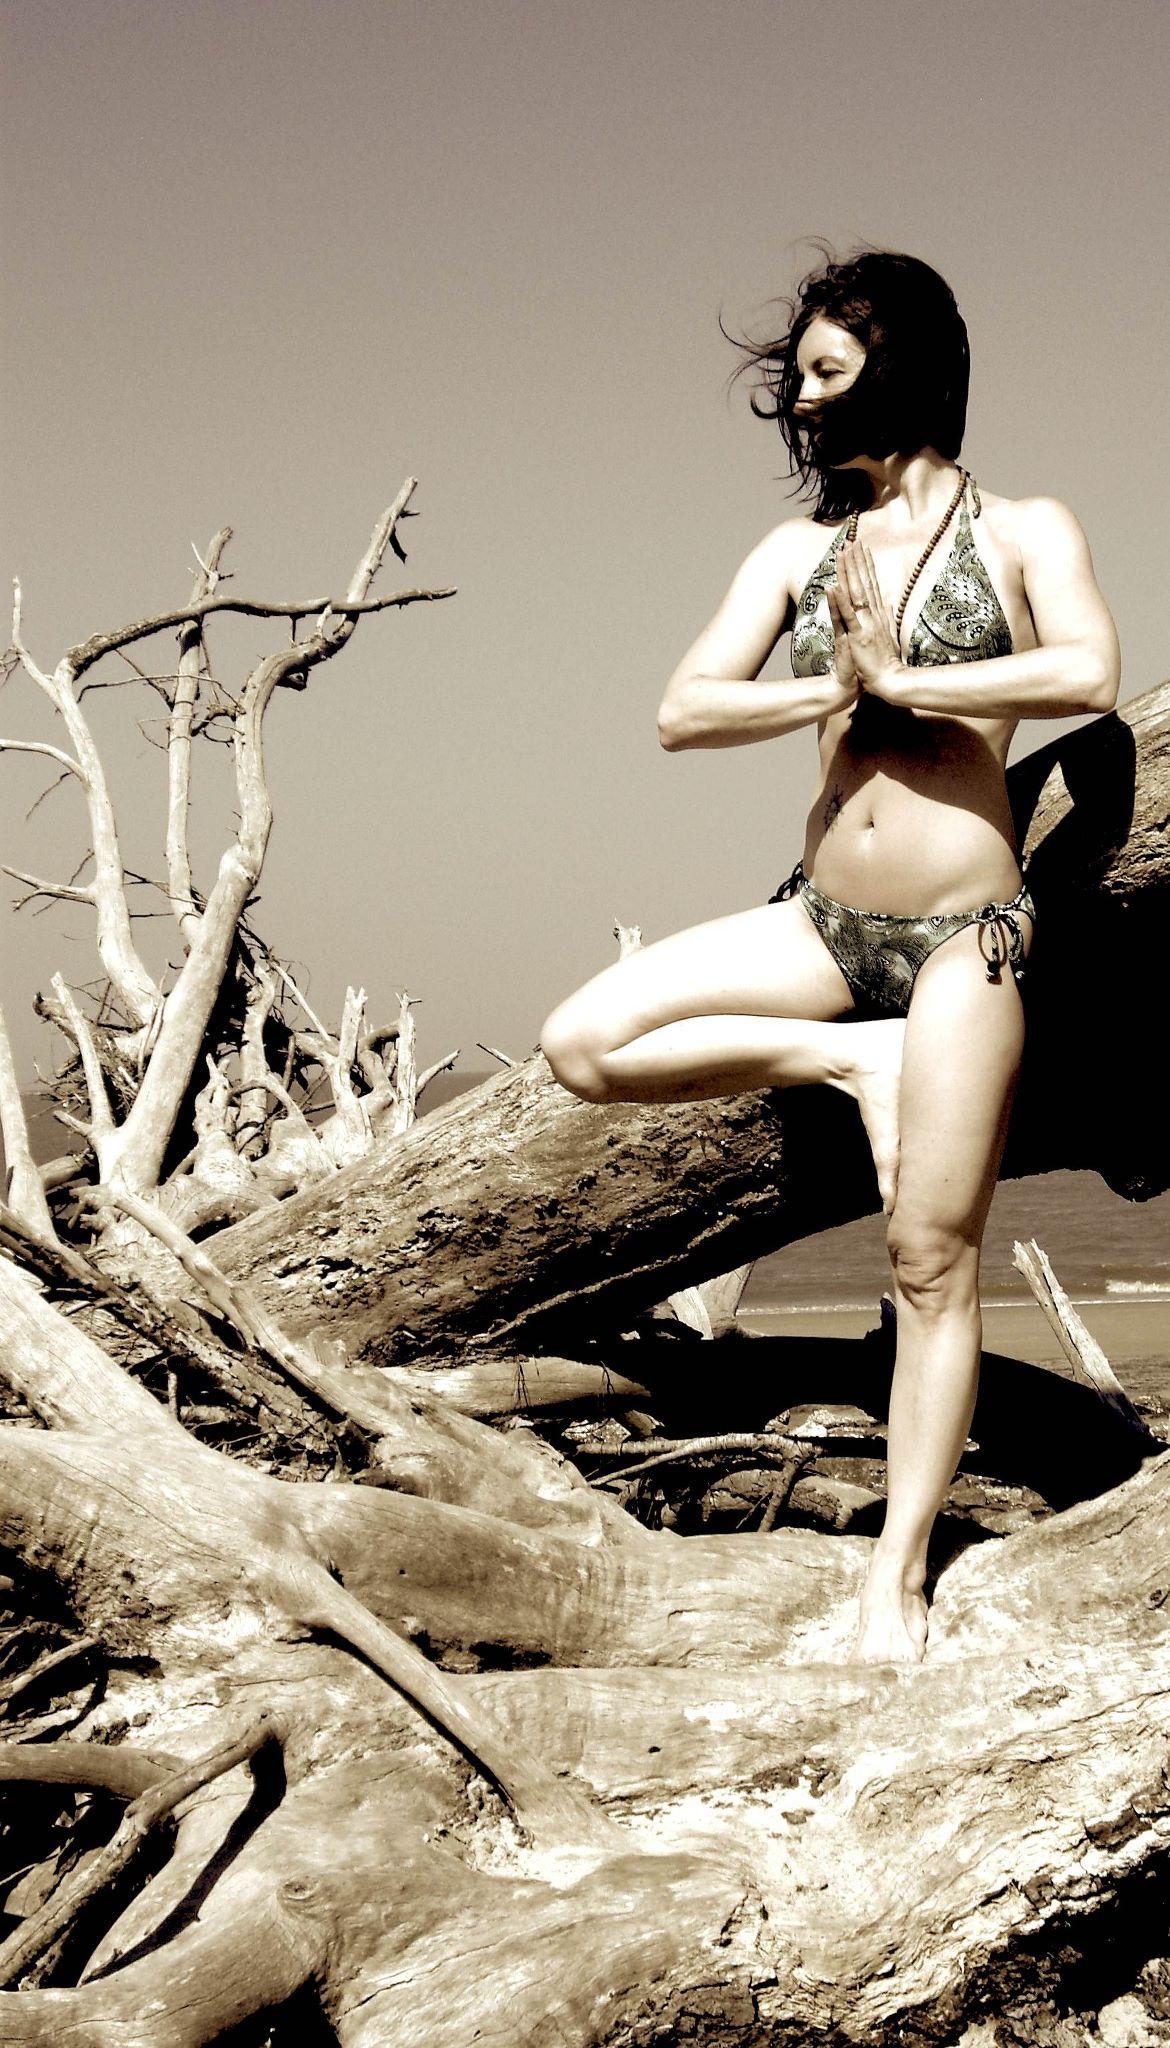 Model: Darlene Bink